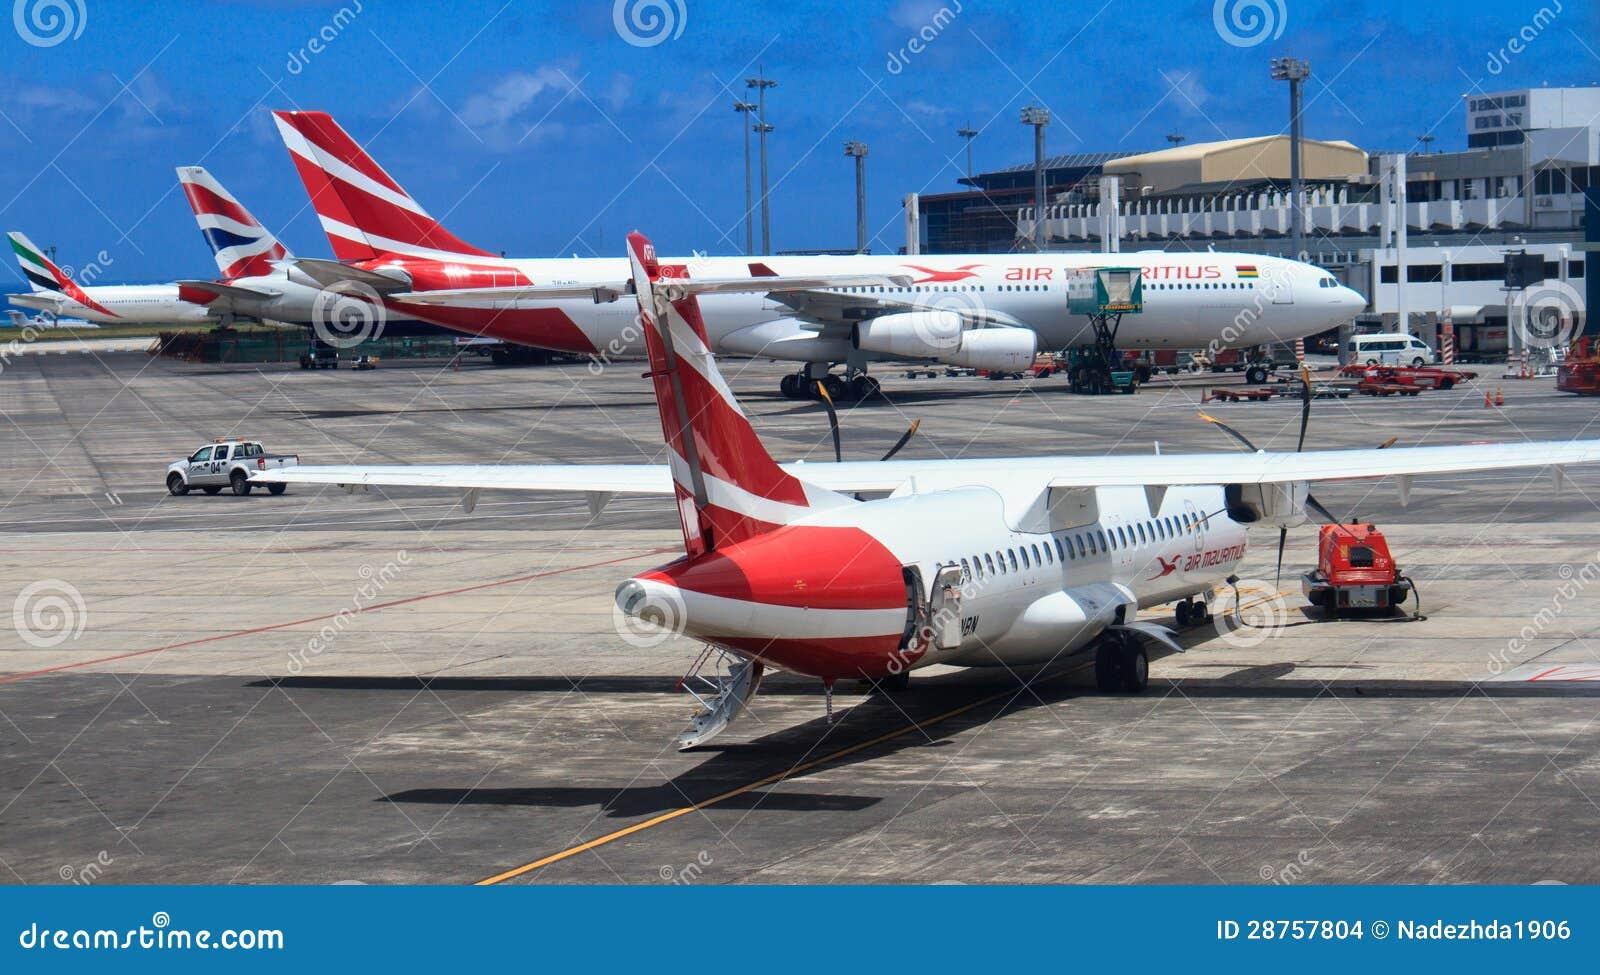 Smeda business plan mauritius airport